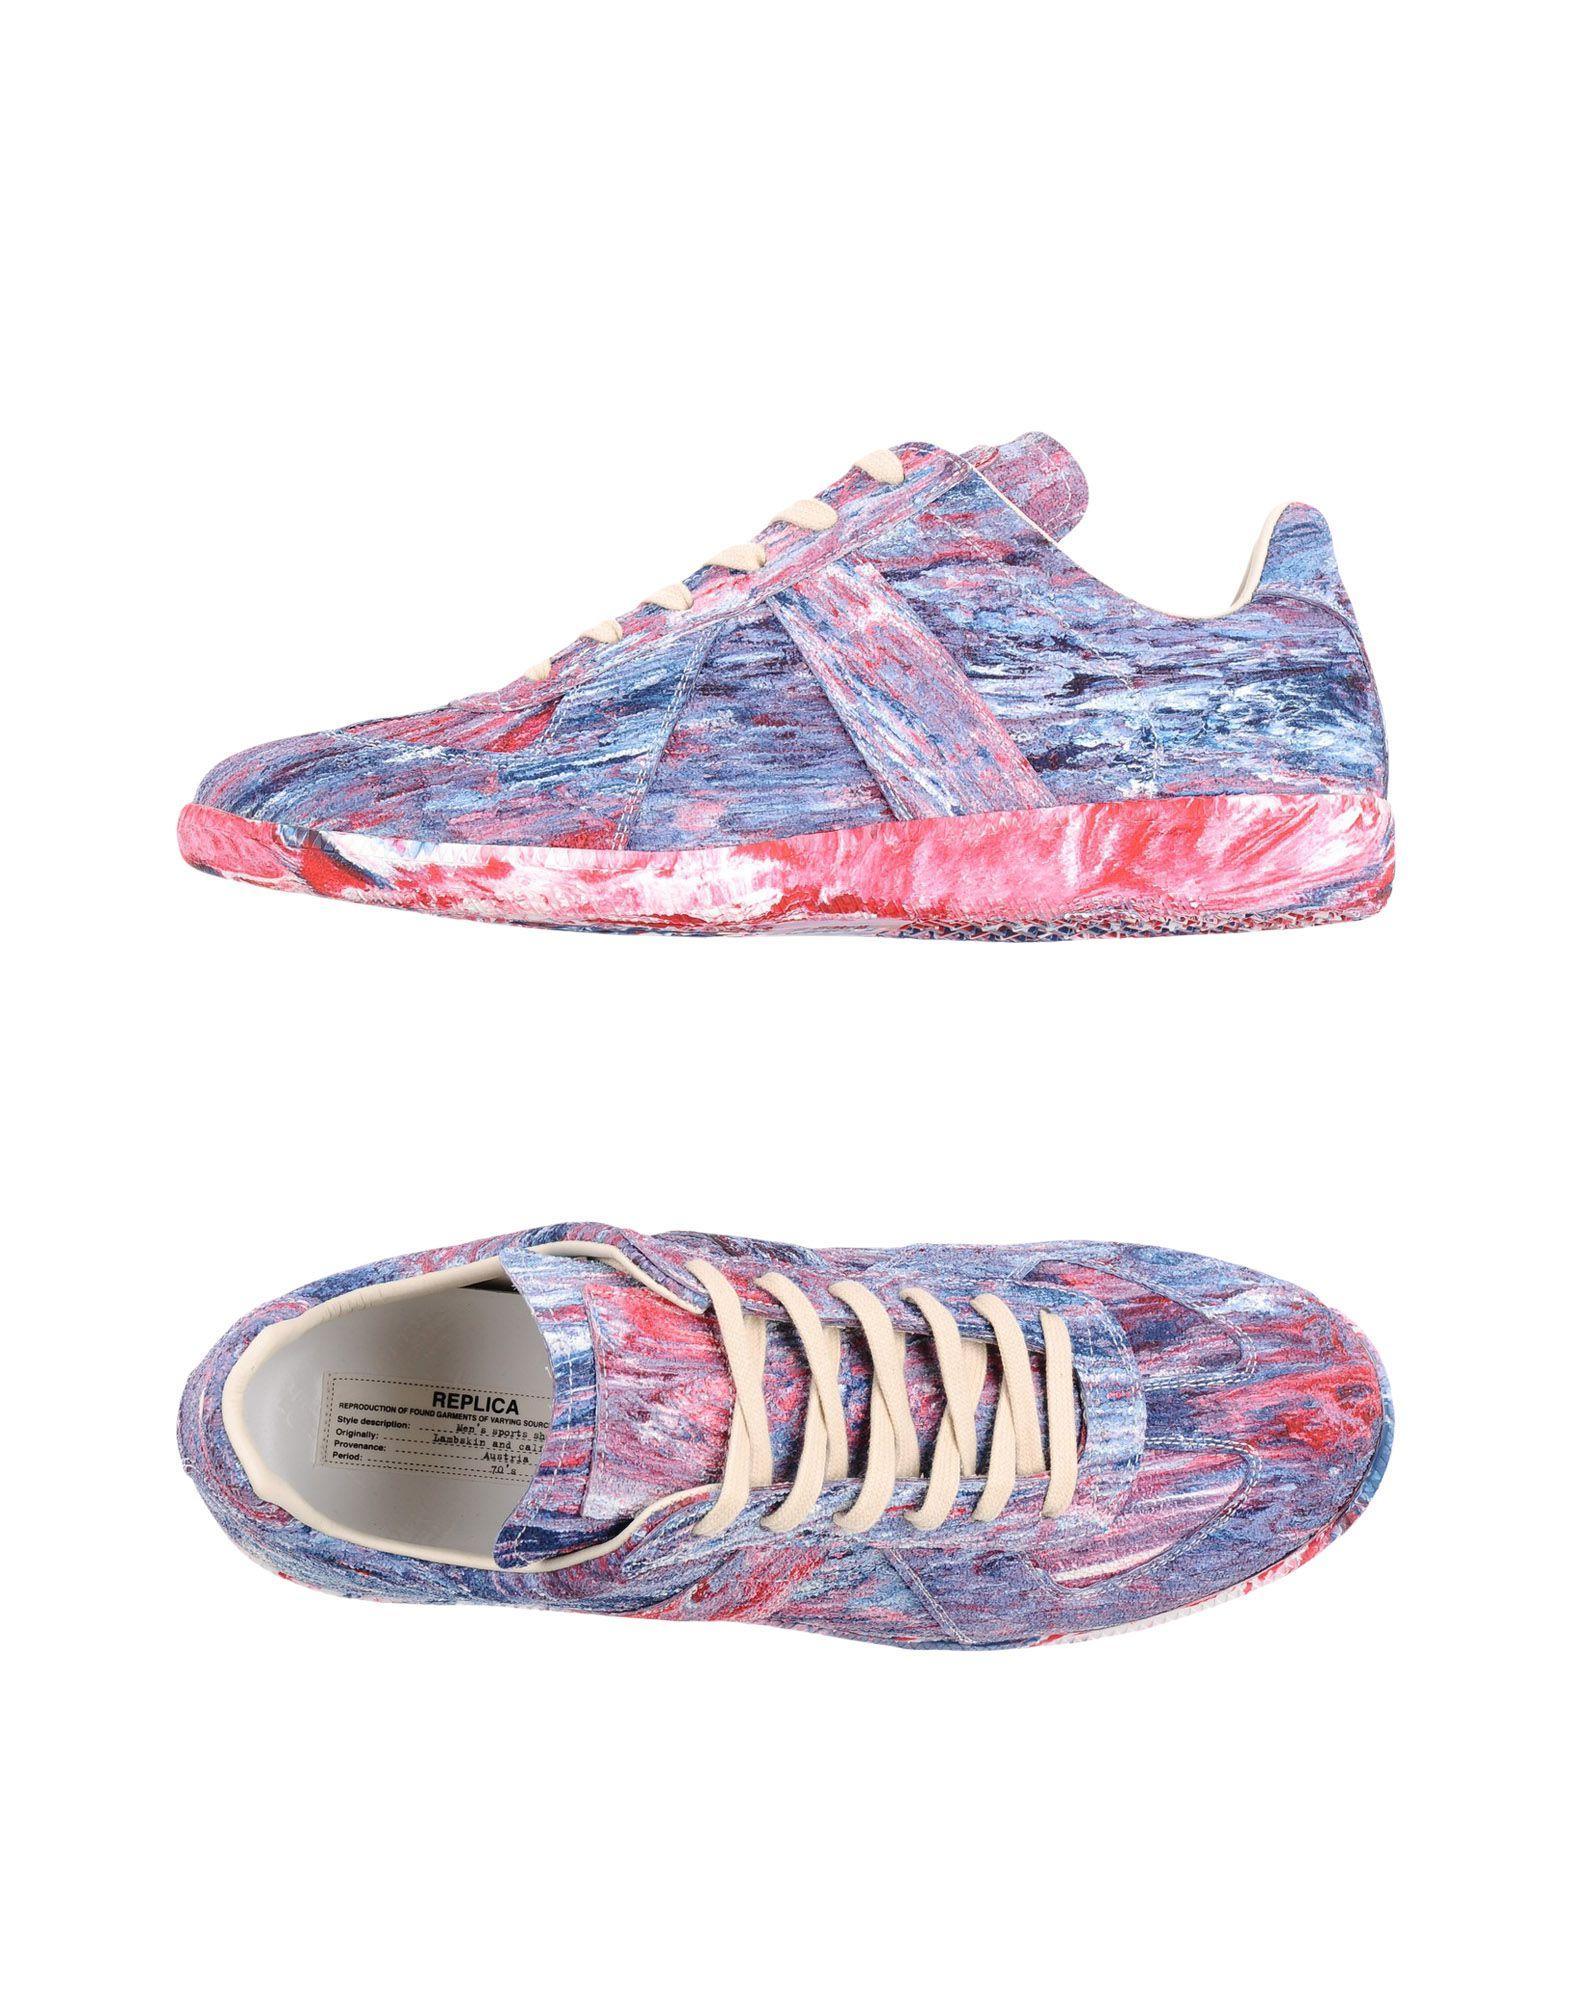 Maison Margiela Sneakers Herren  11343518HU Gute Qualität beliebte Schuhe